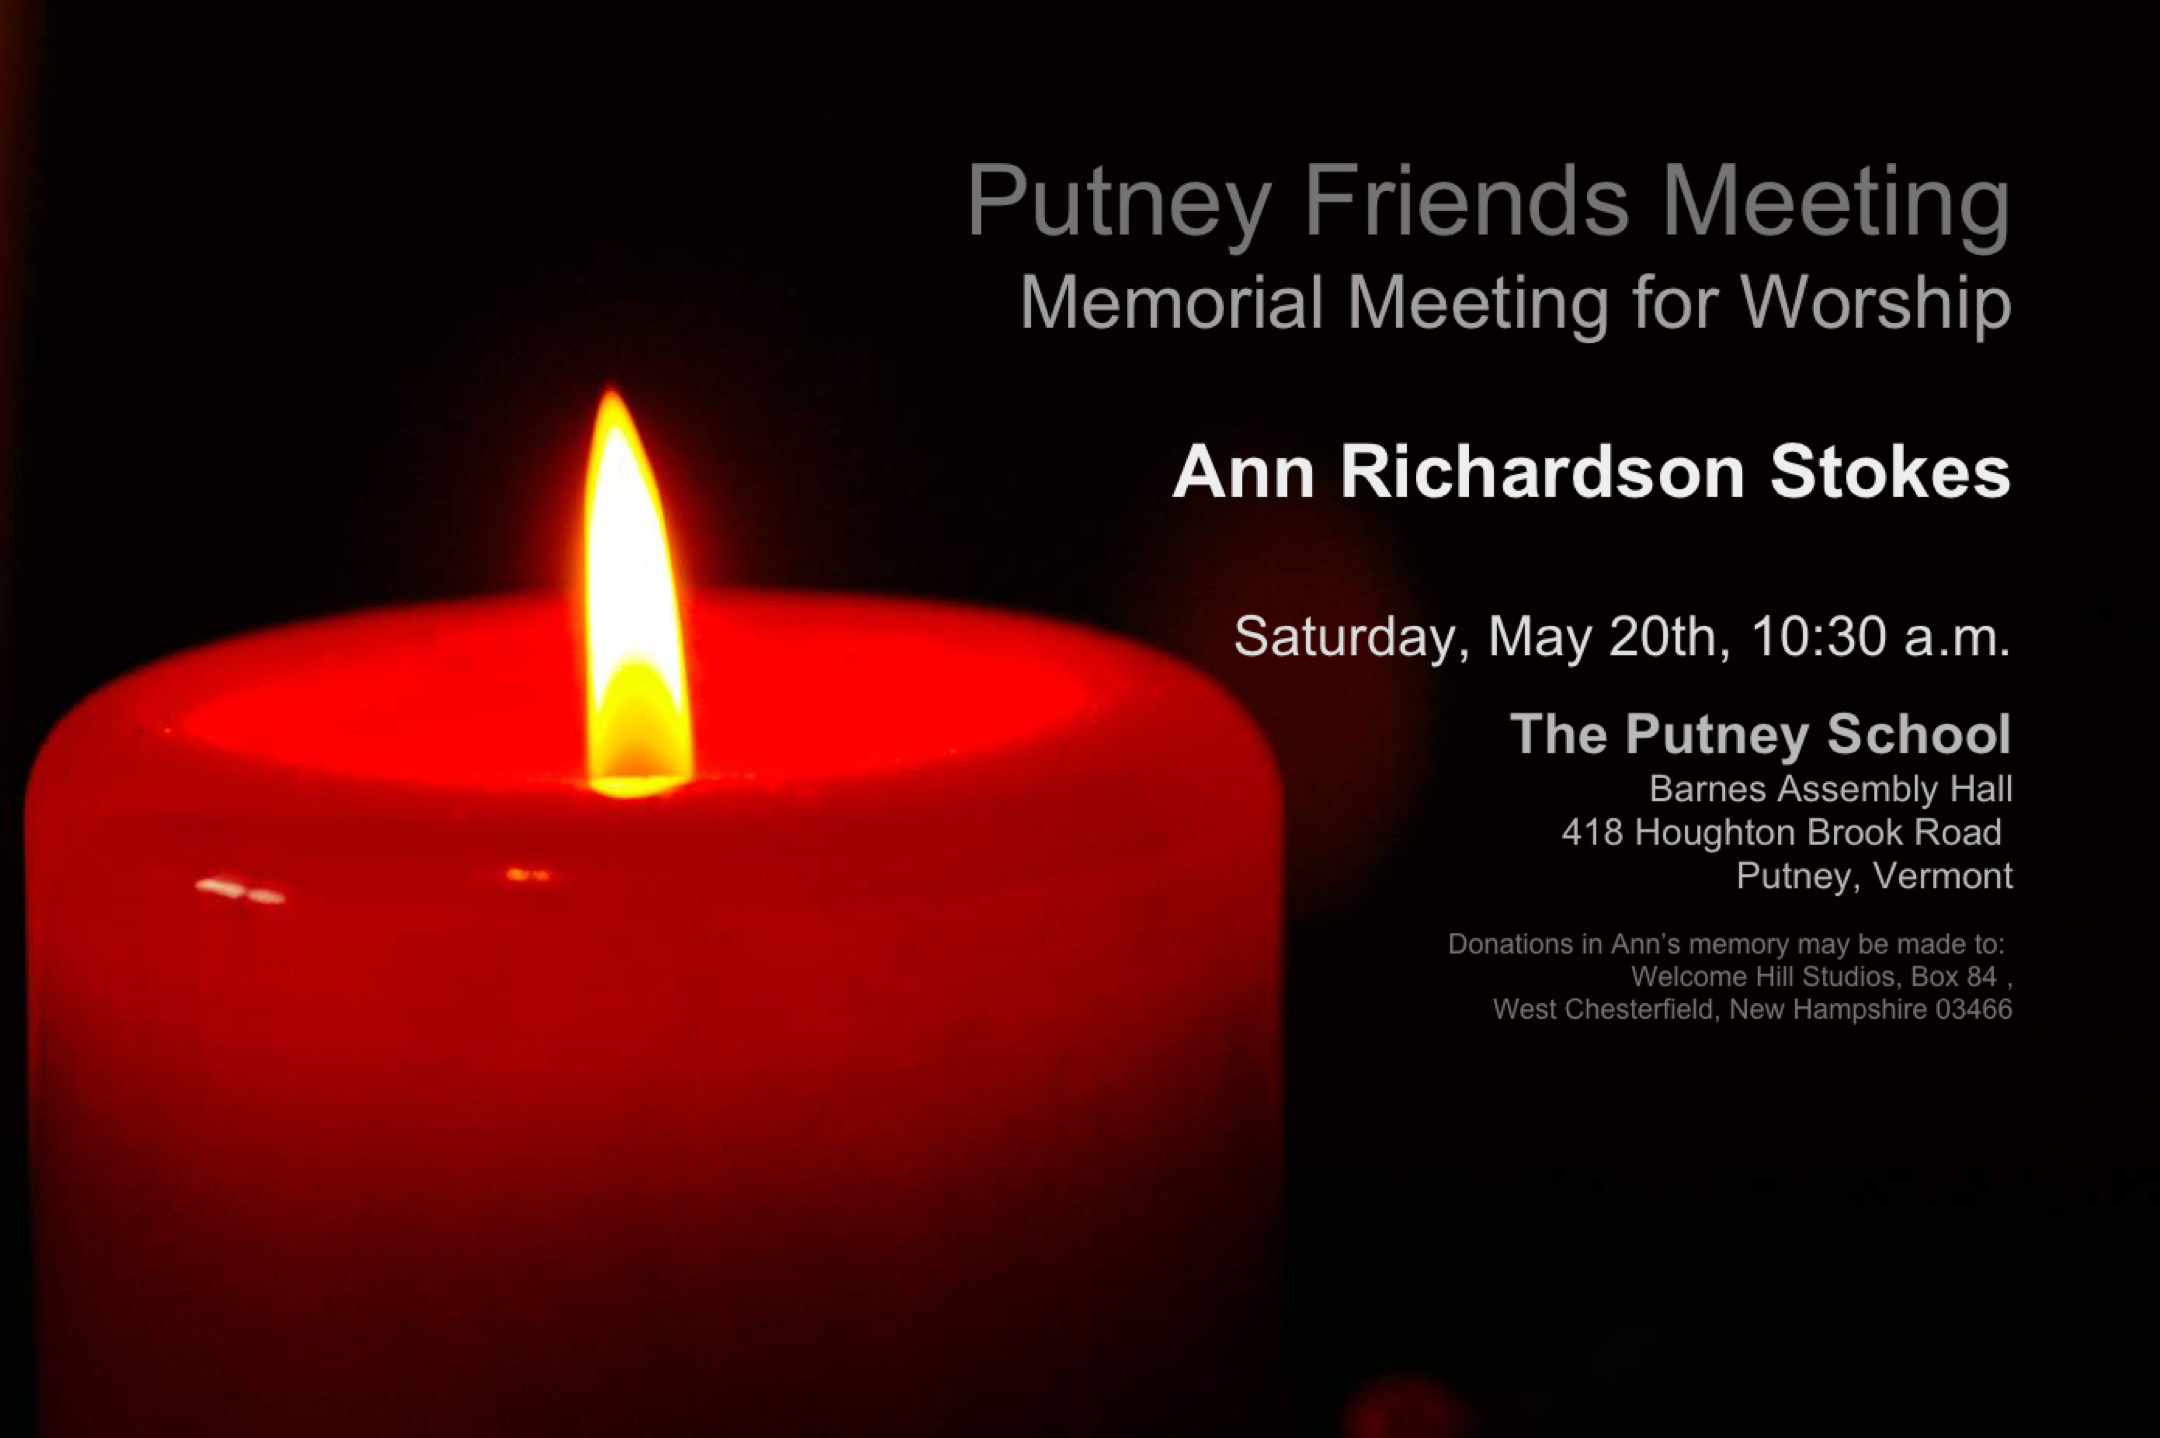 Ann Stokes Memorial Meeting